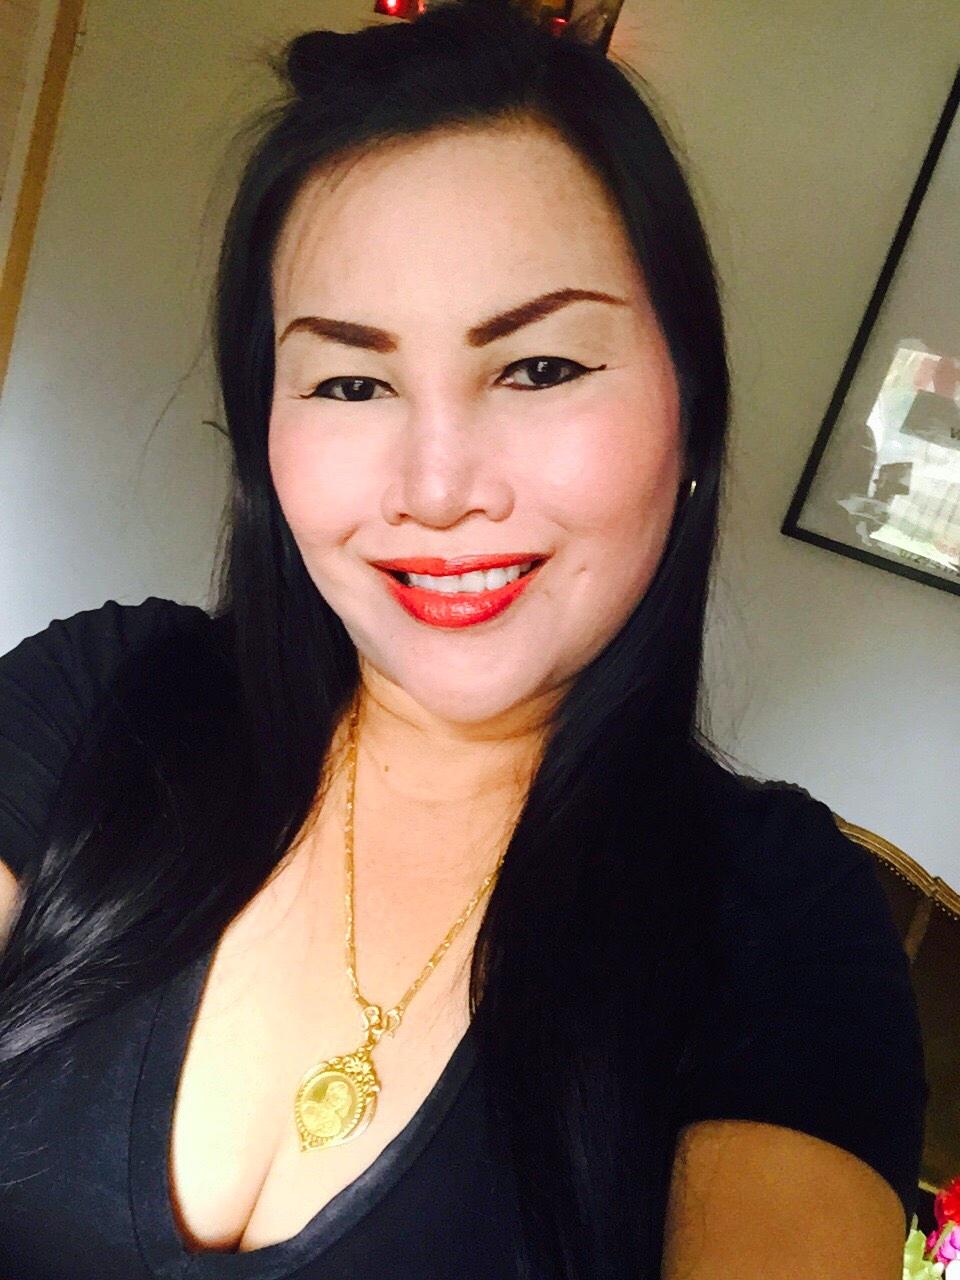 gratis helt dejtingsidor tyreso Thaimassage